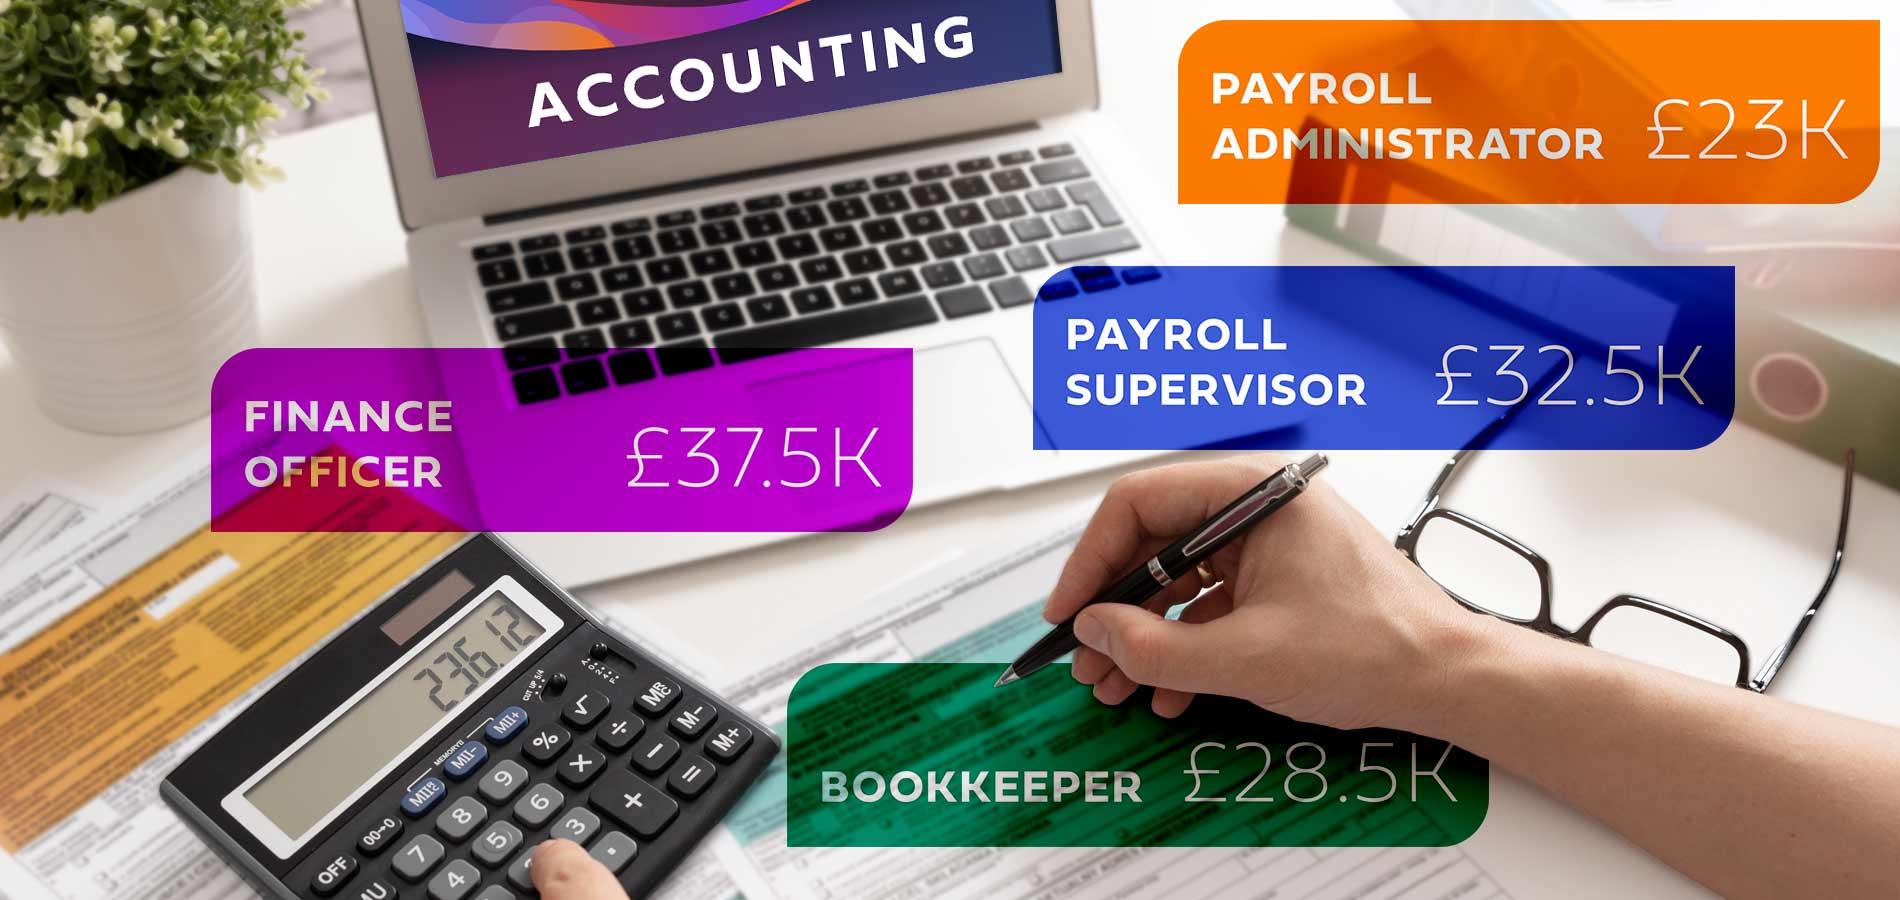 Where can accounting take you?